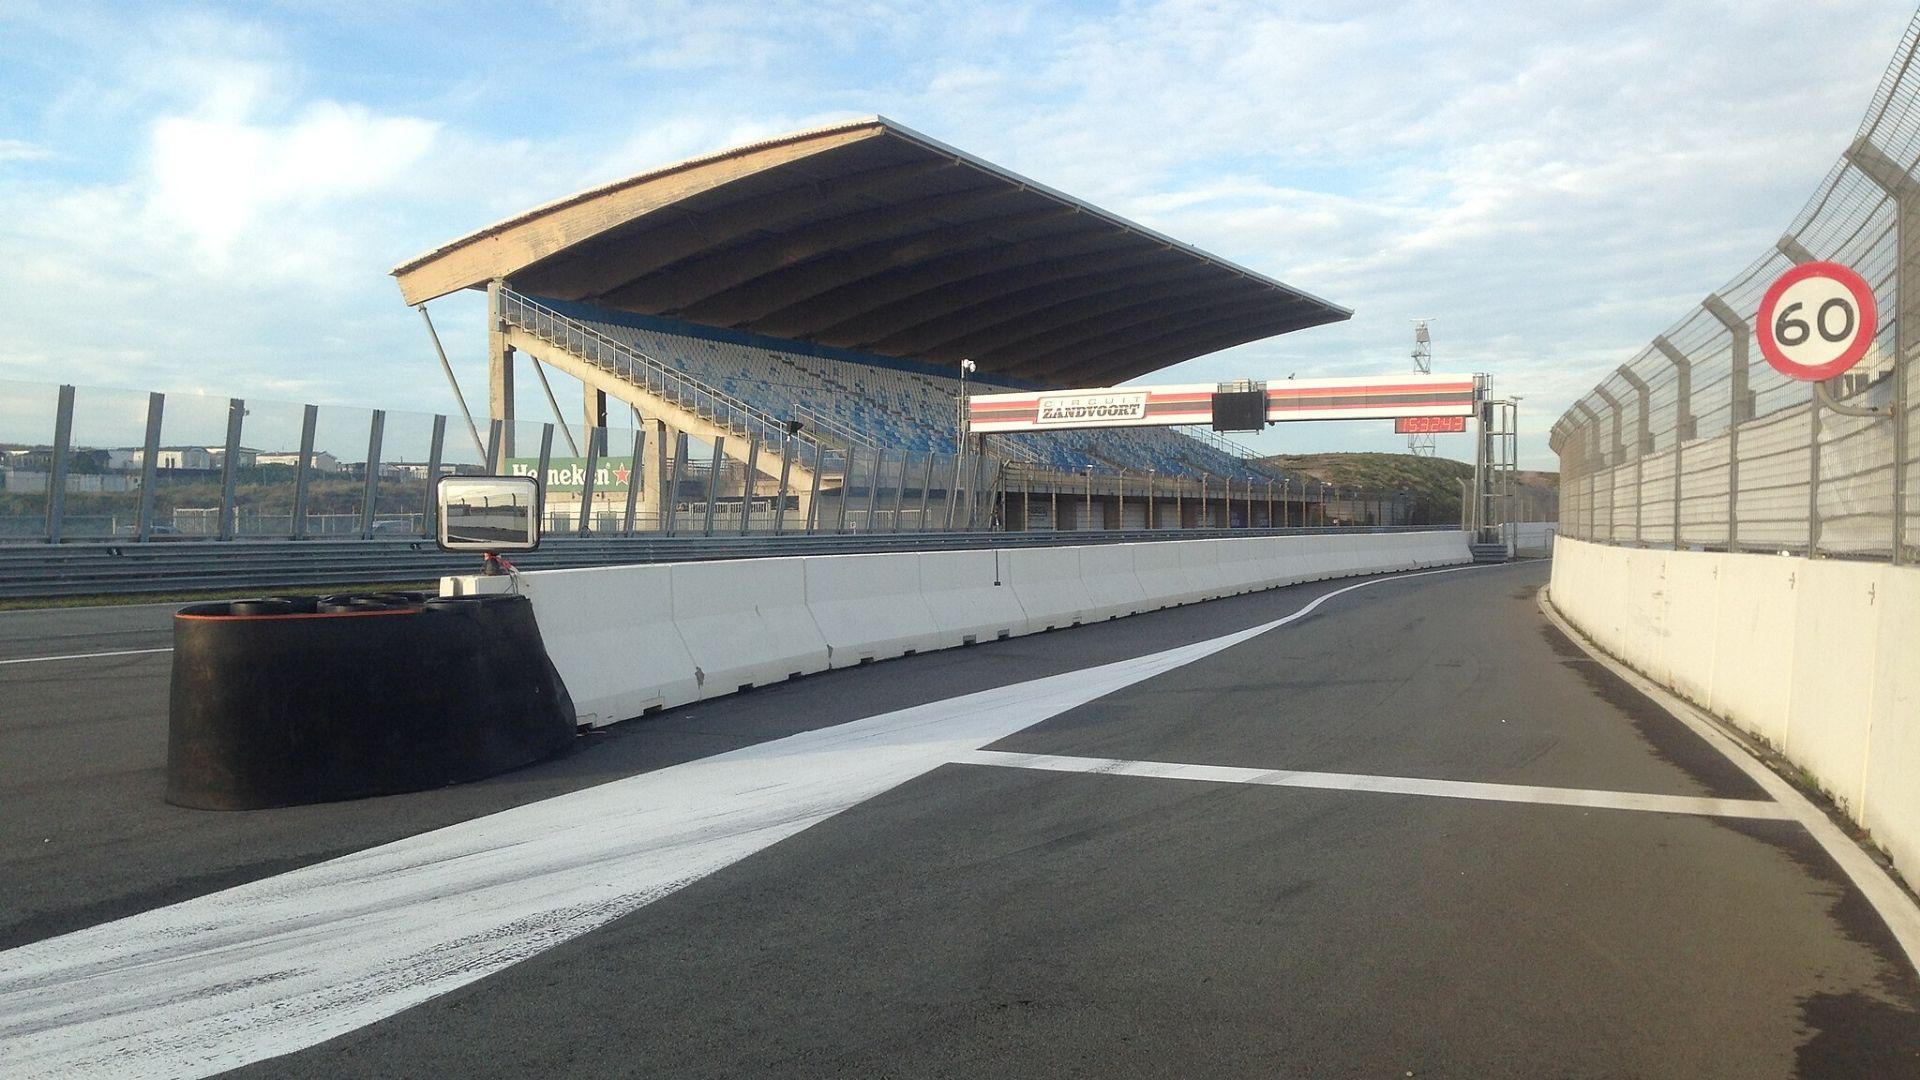 Circuito di Zandvoort